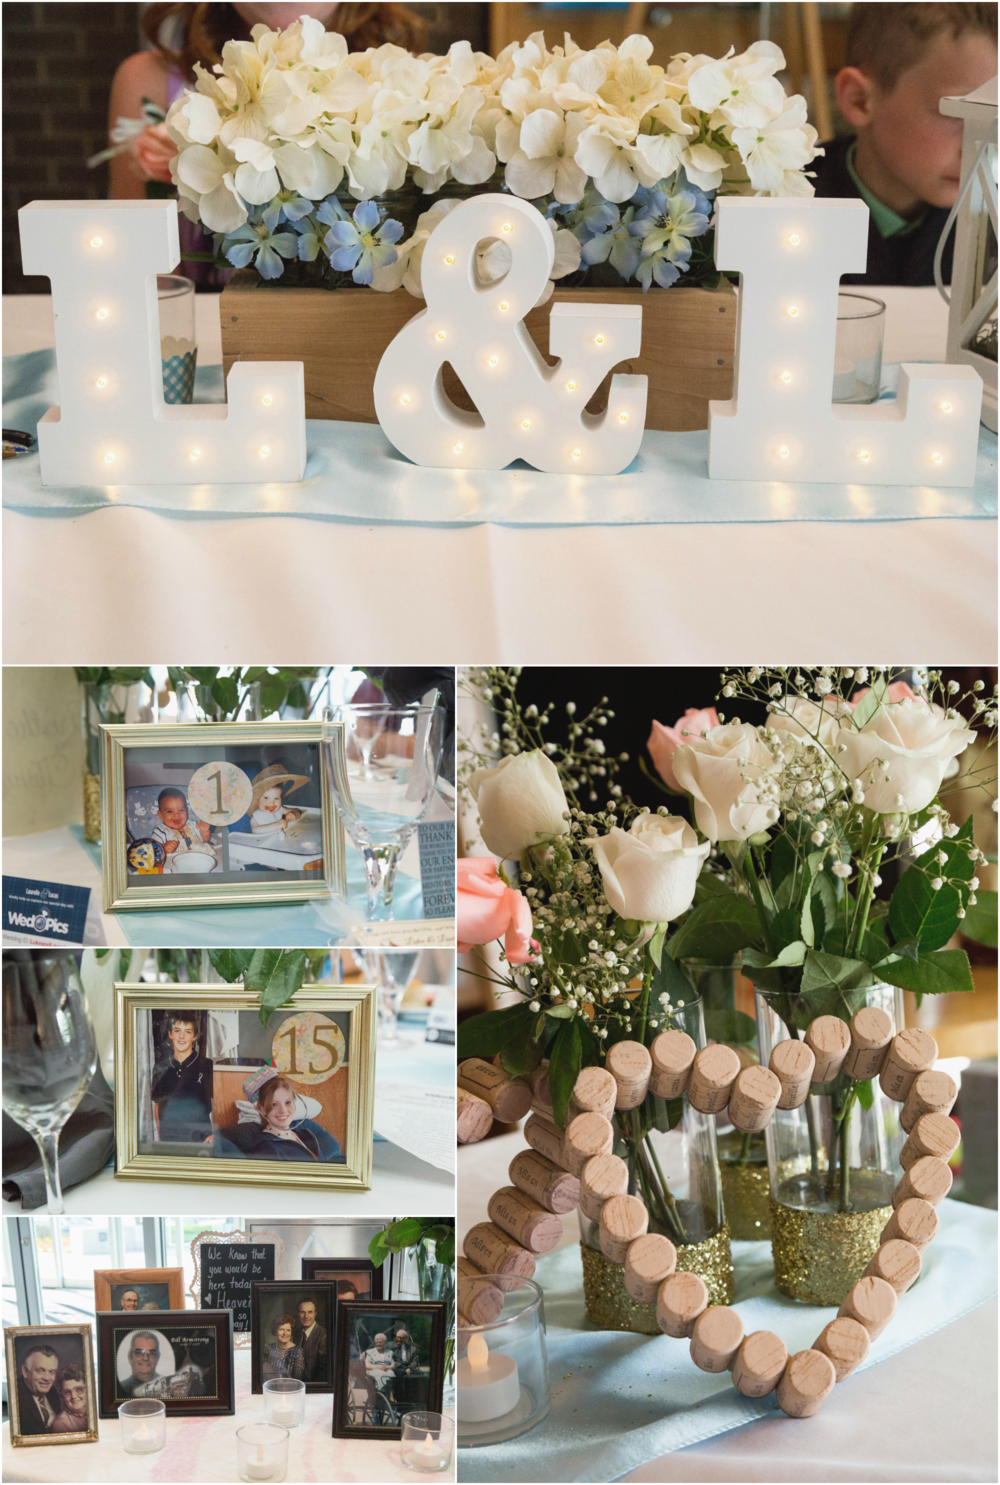 st_patricks_church_wedding_22_esplanade.png